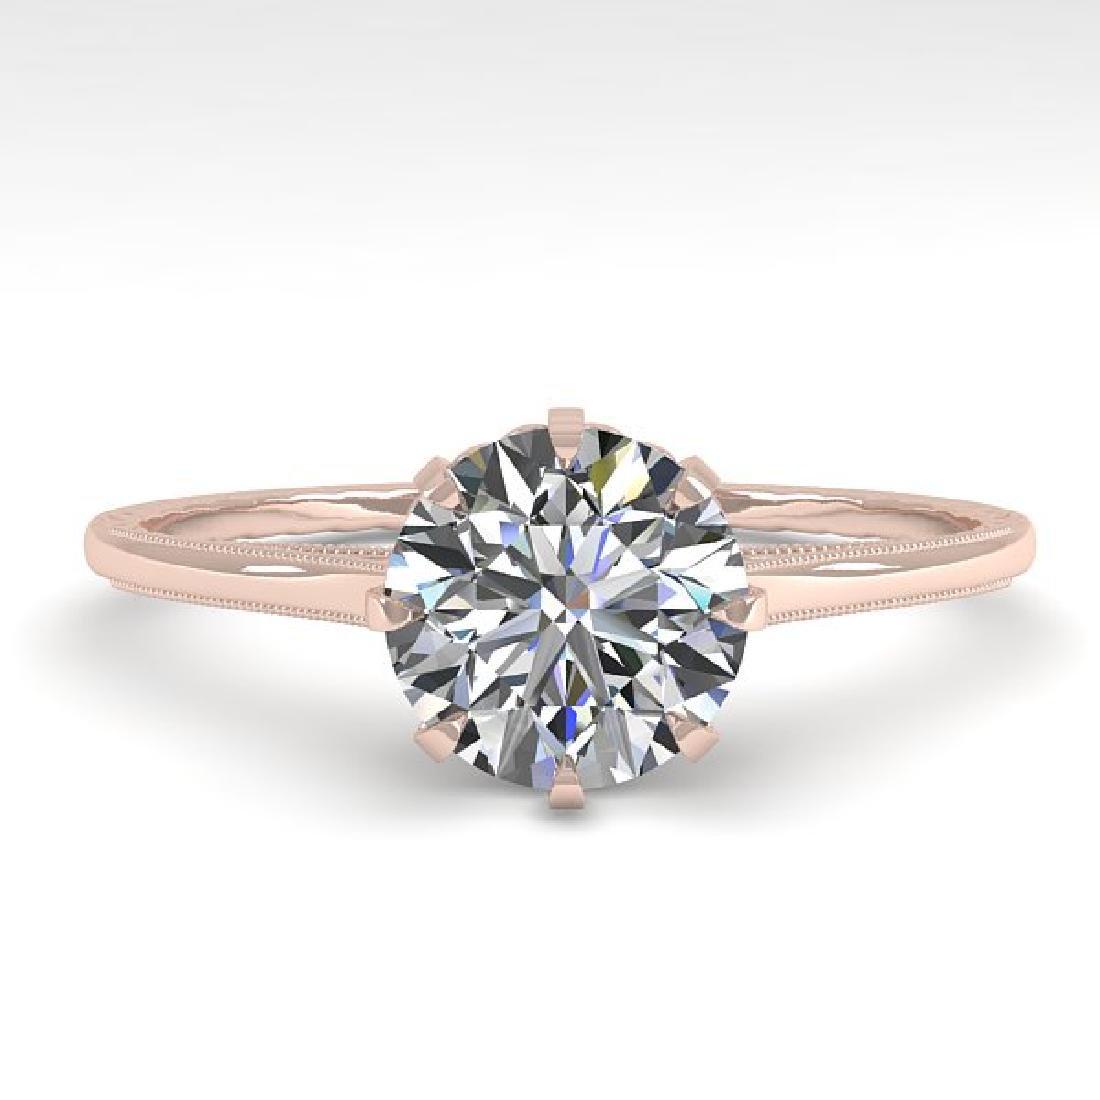 1.0 CTW Certified VS/SI Diamond Ring 14K Rose Gold